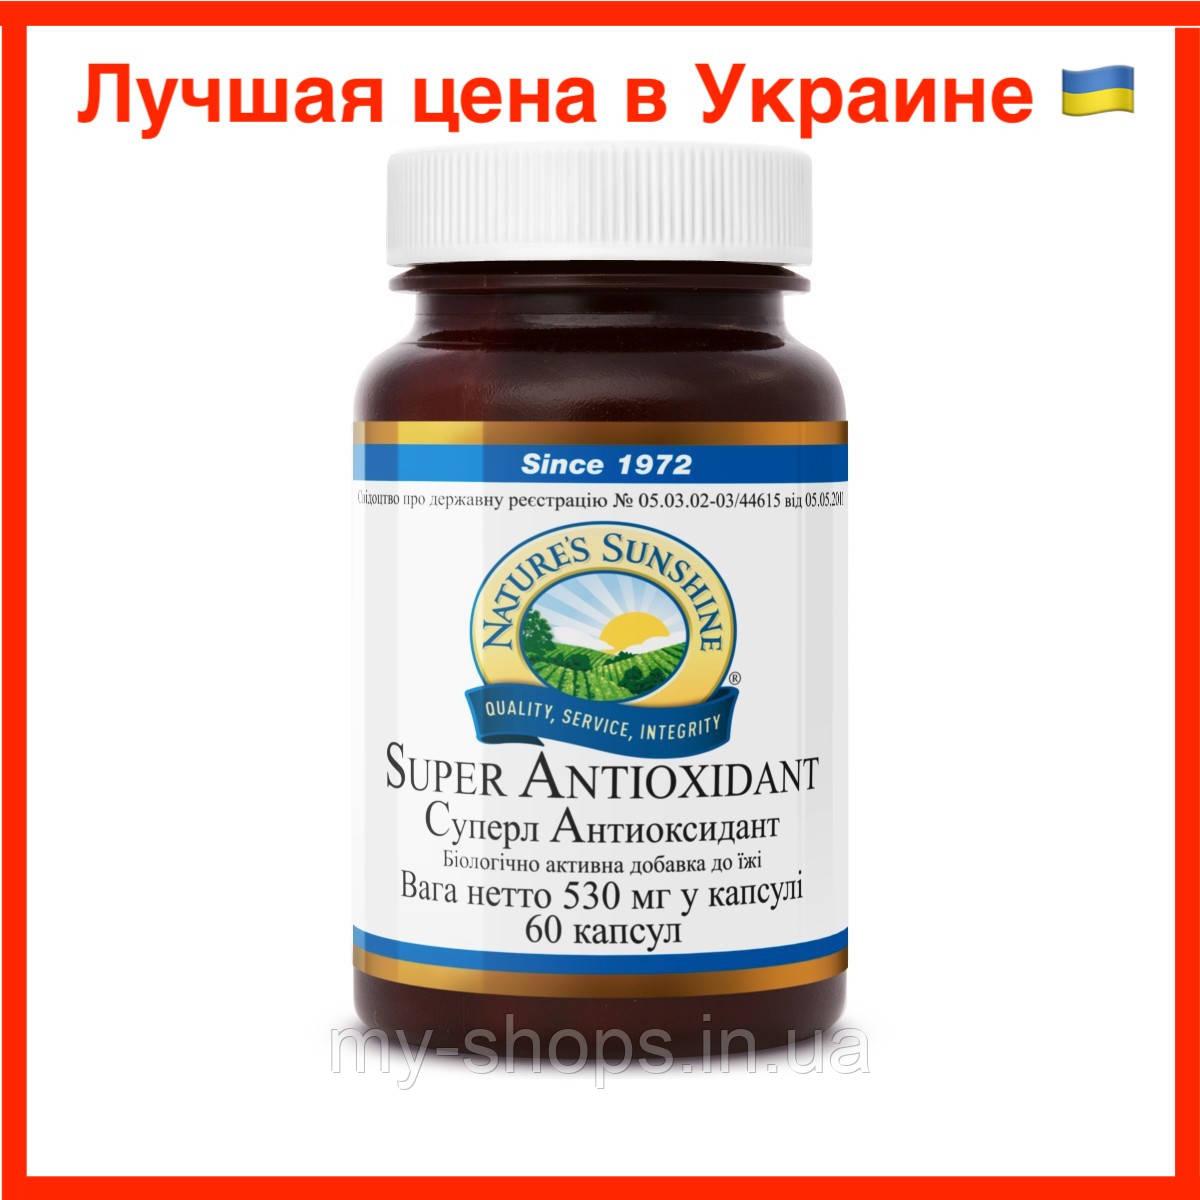 Антиоксидант НСП. Натуральная БИОДОБАВКА